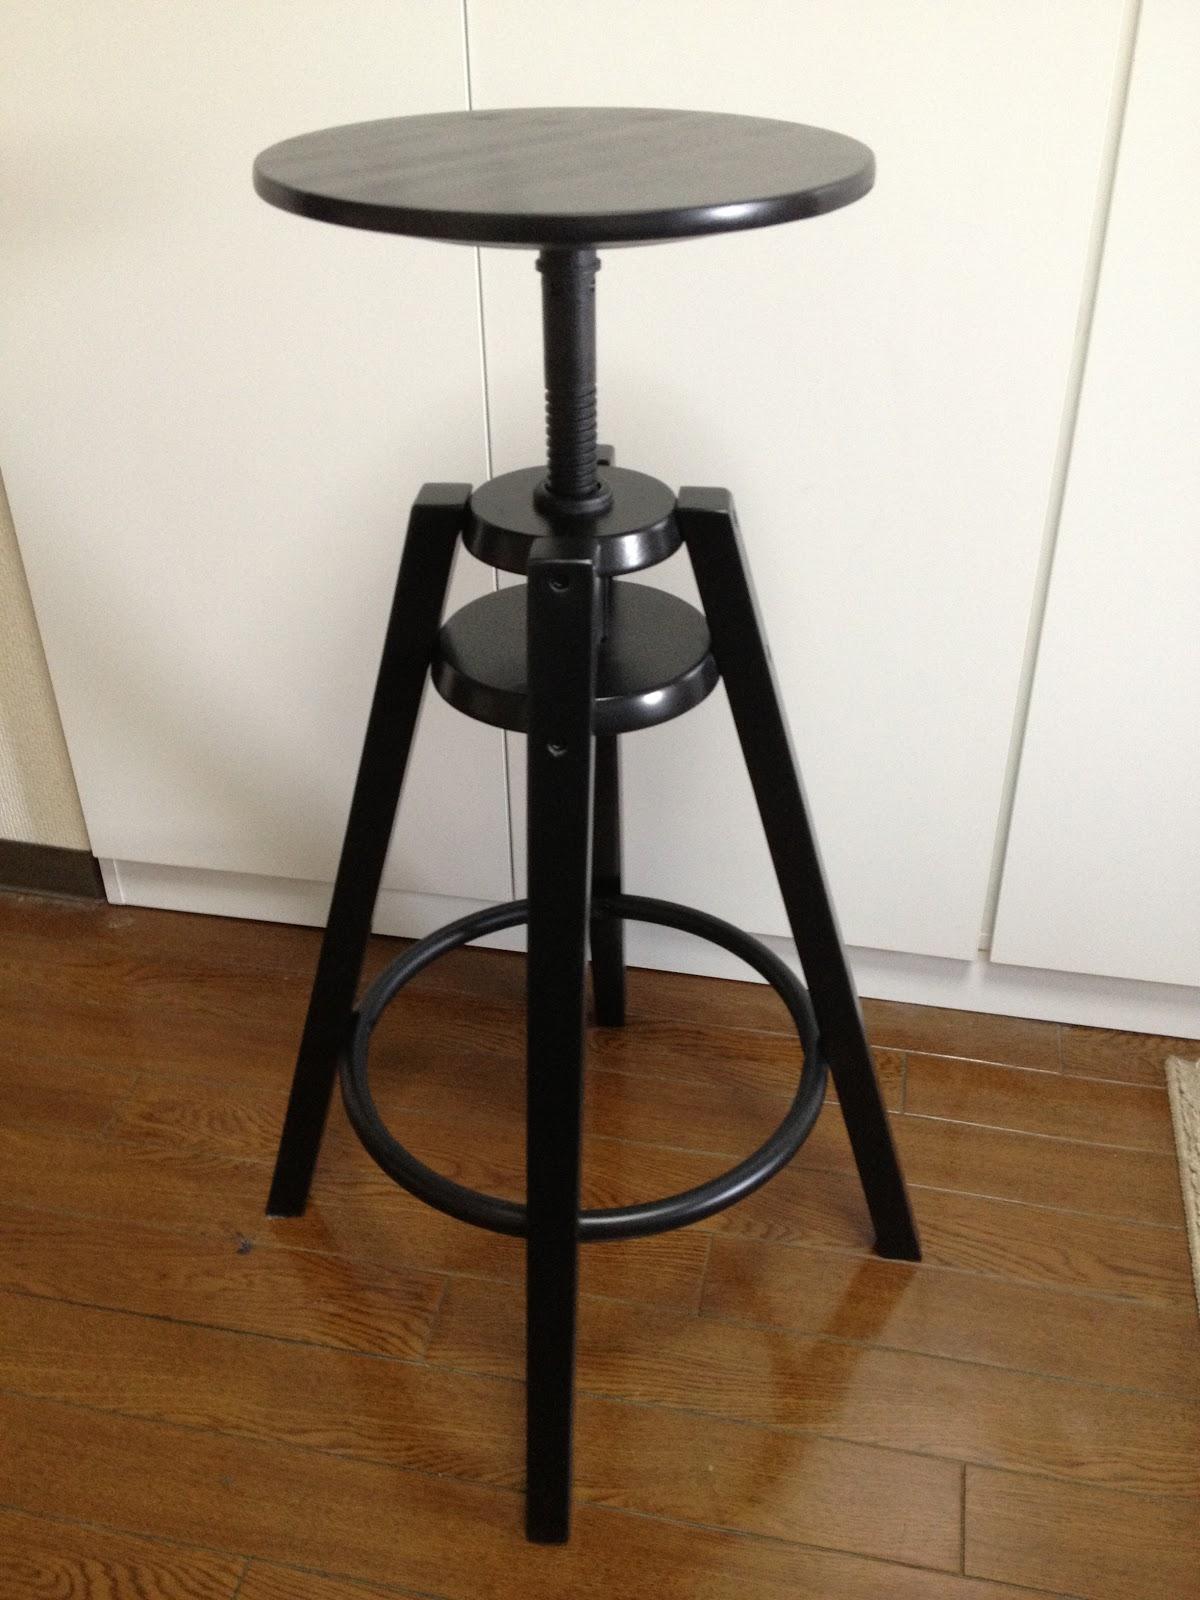 Dalfred bar stool design decoration for Barhocker diy